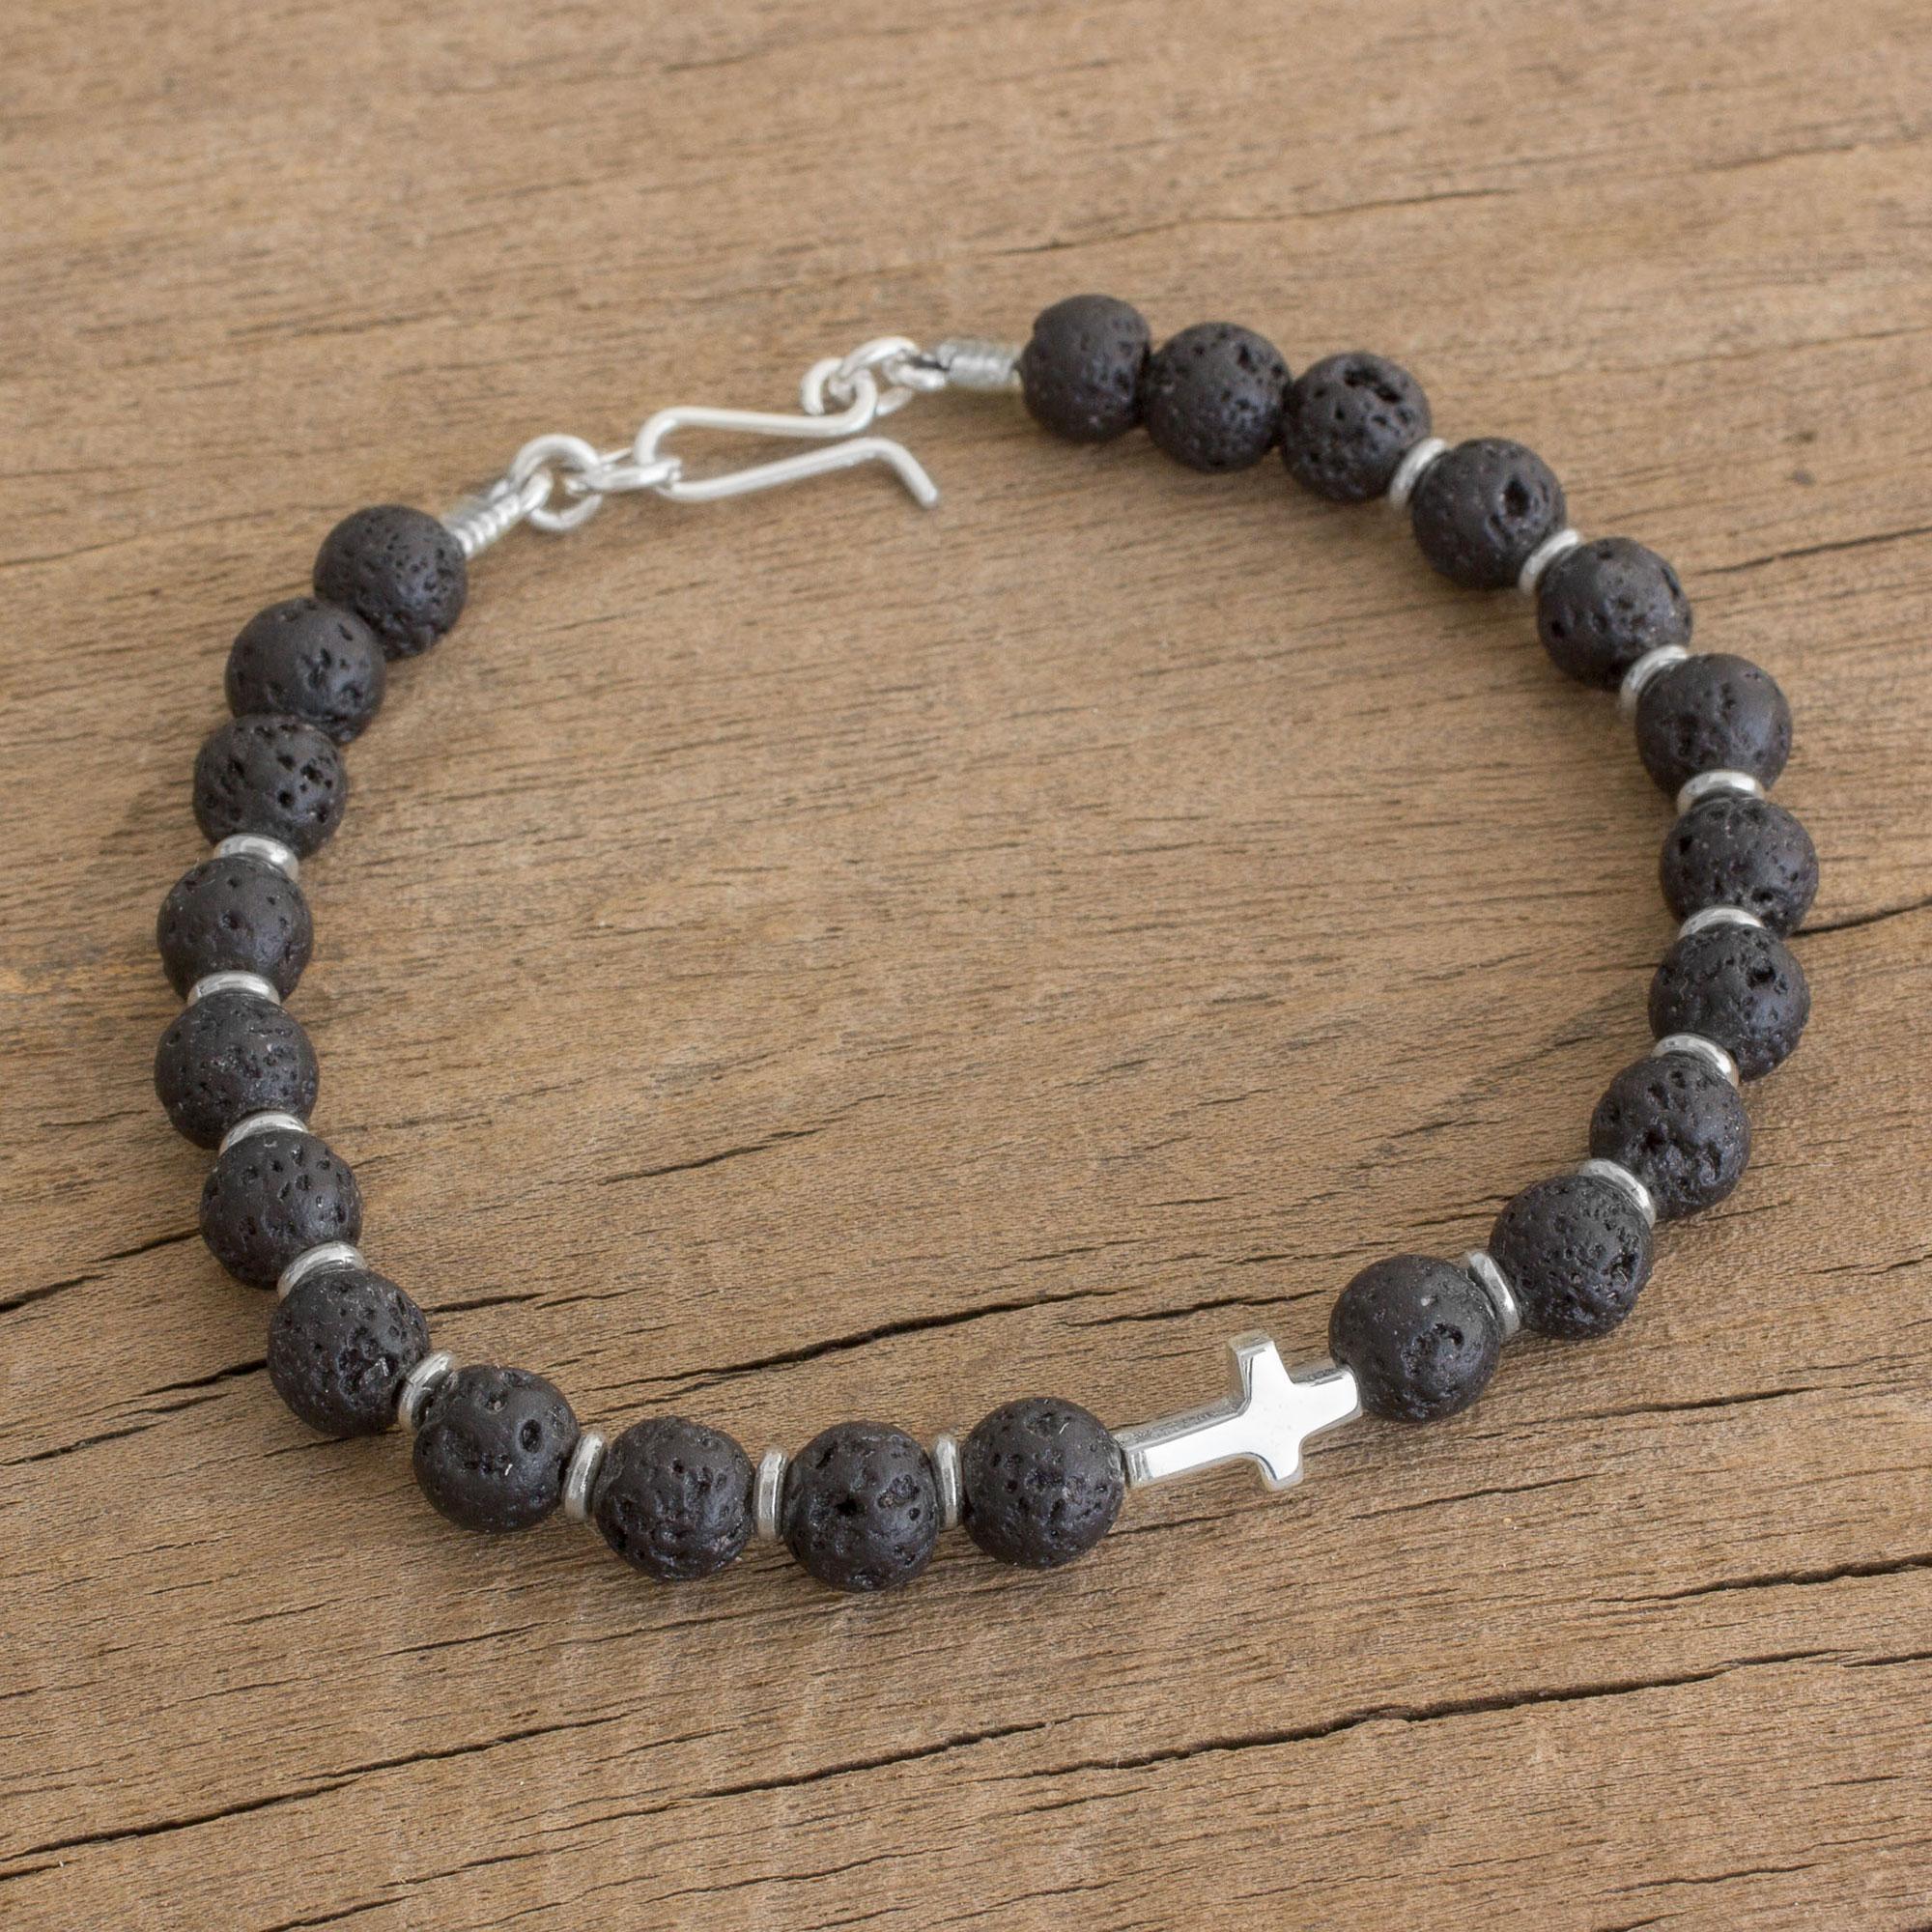 e80990ece0 Sterling Silver Cross and Black Volcanic Rock Bead Bracelet - Cross ...